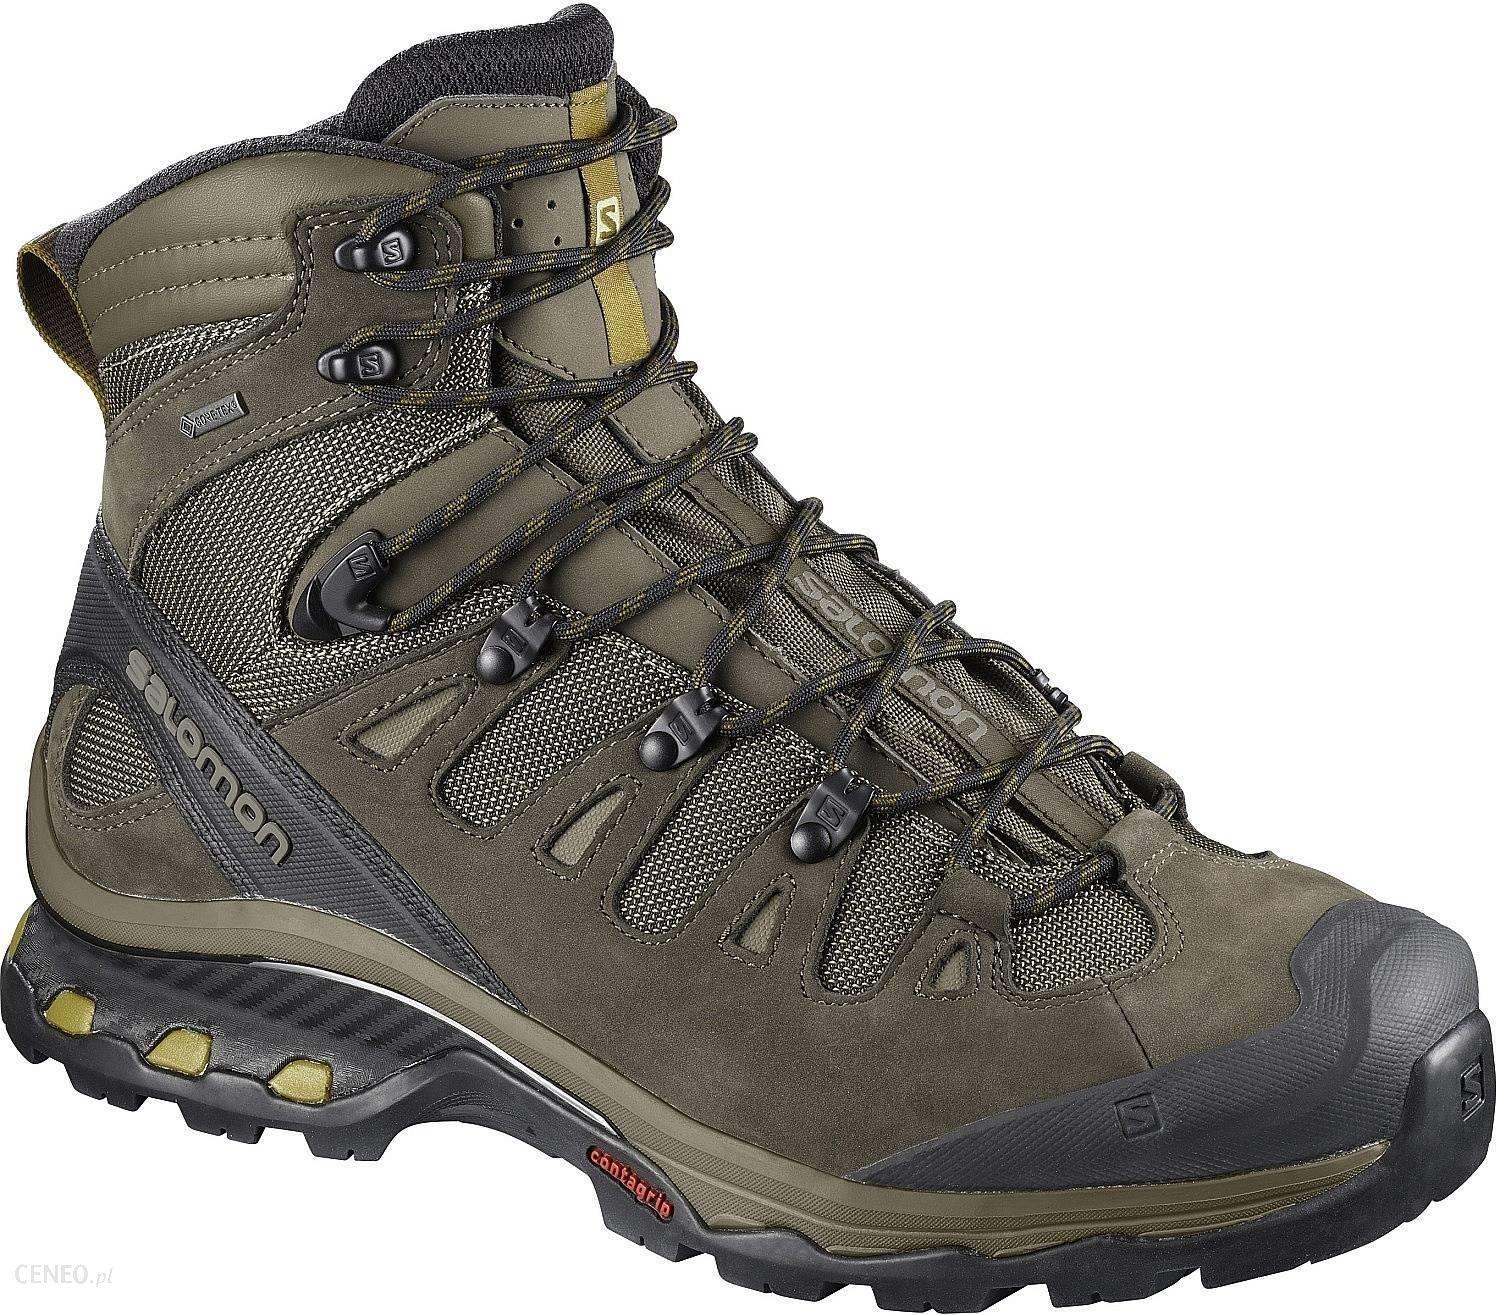 Buty trekkingowe Salomon Quest 4D 3 Gtx Wren Bungee Cord Ceny i opinie Ceneo.pl